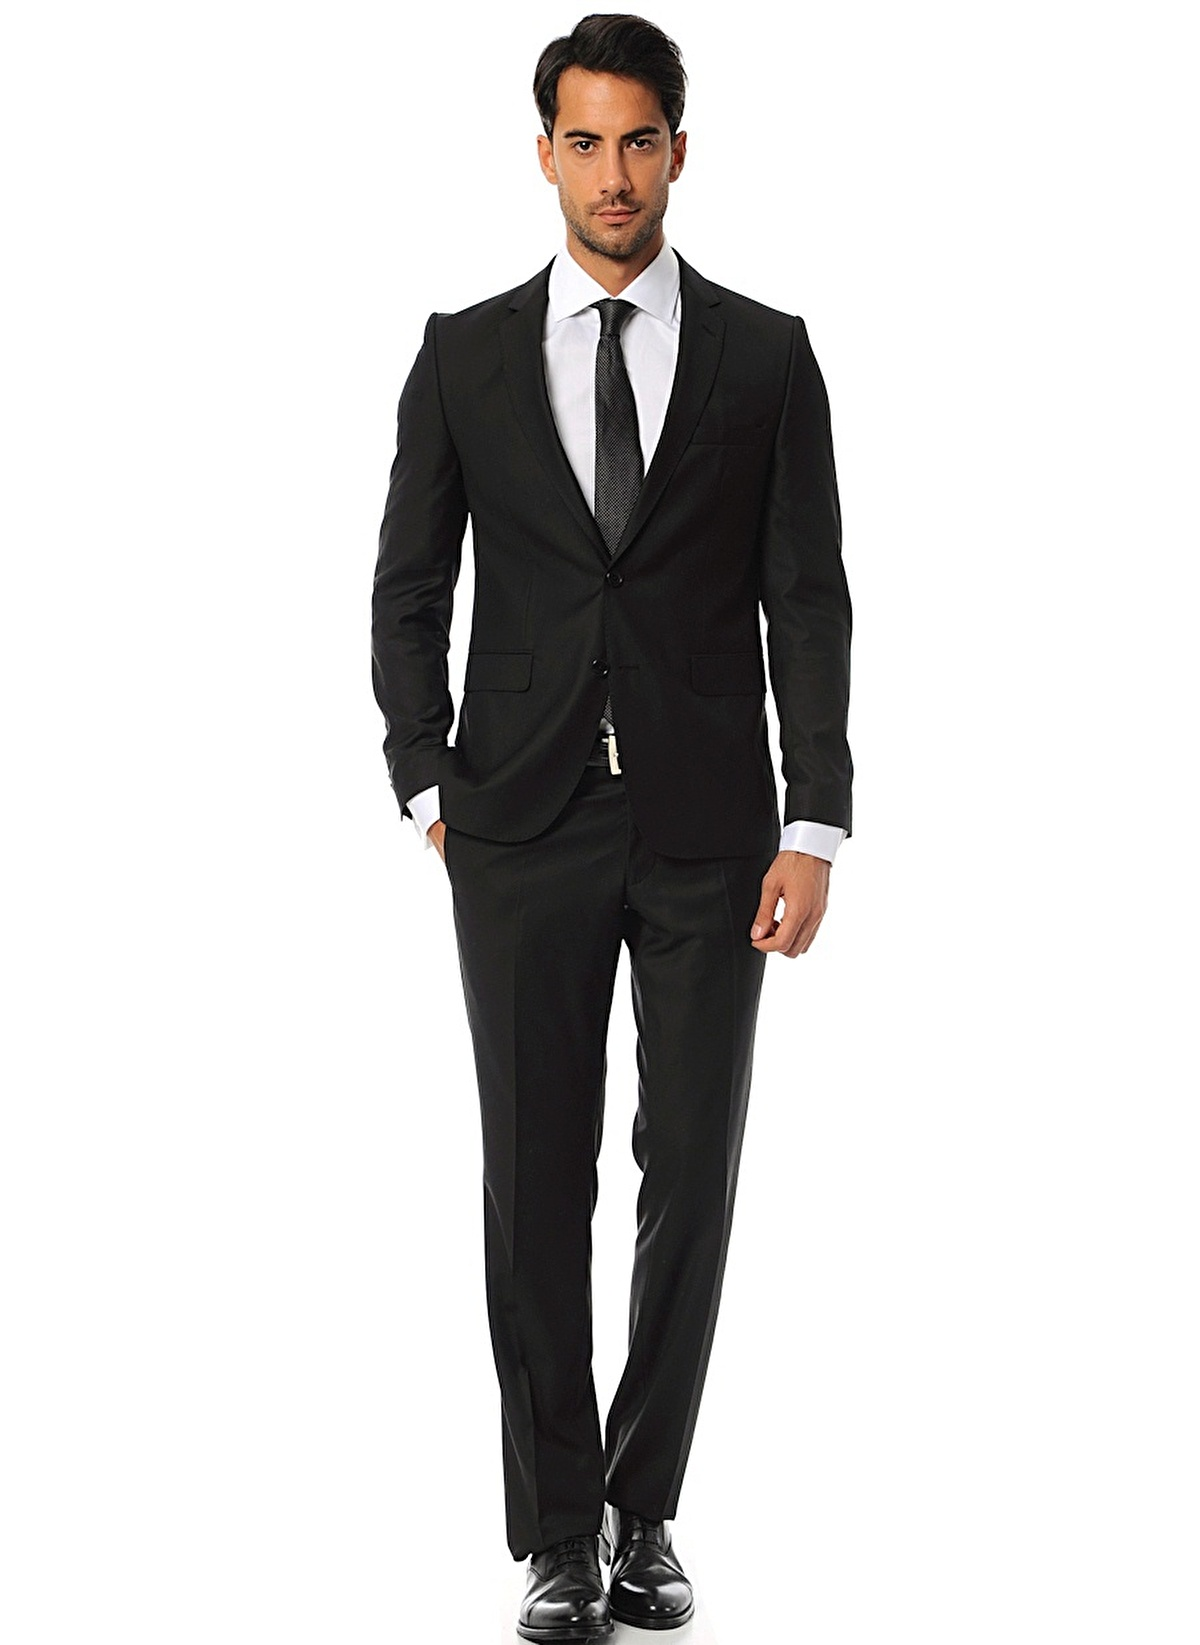 52f0fe7e3dd98 Pierre Cardin Erkek Takım Elbise Siyah | Morhipo | 13875430